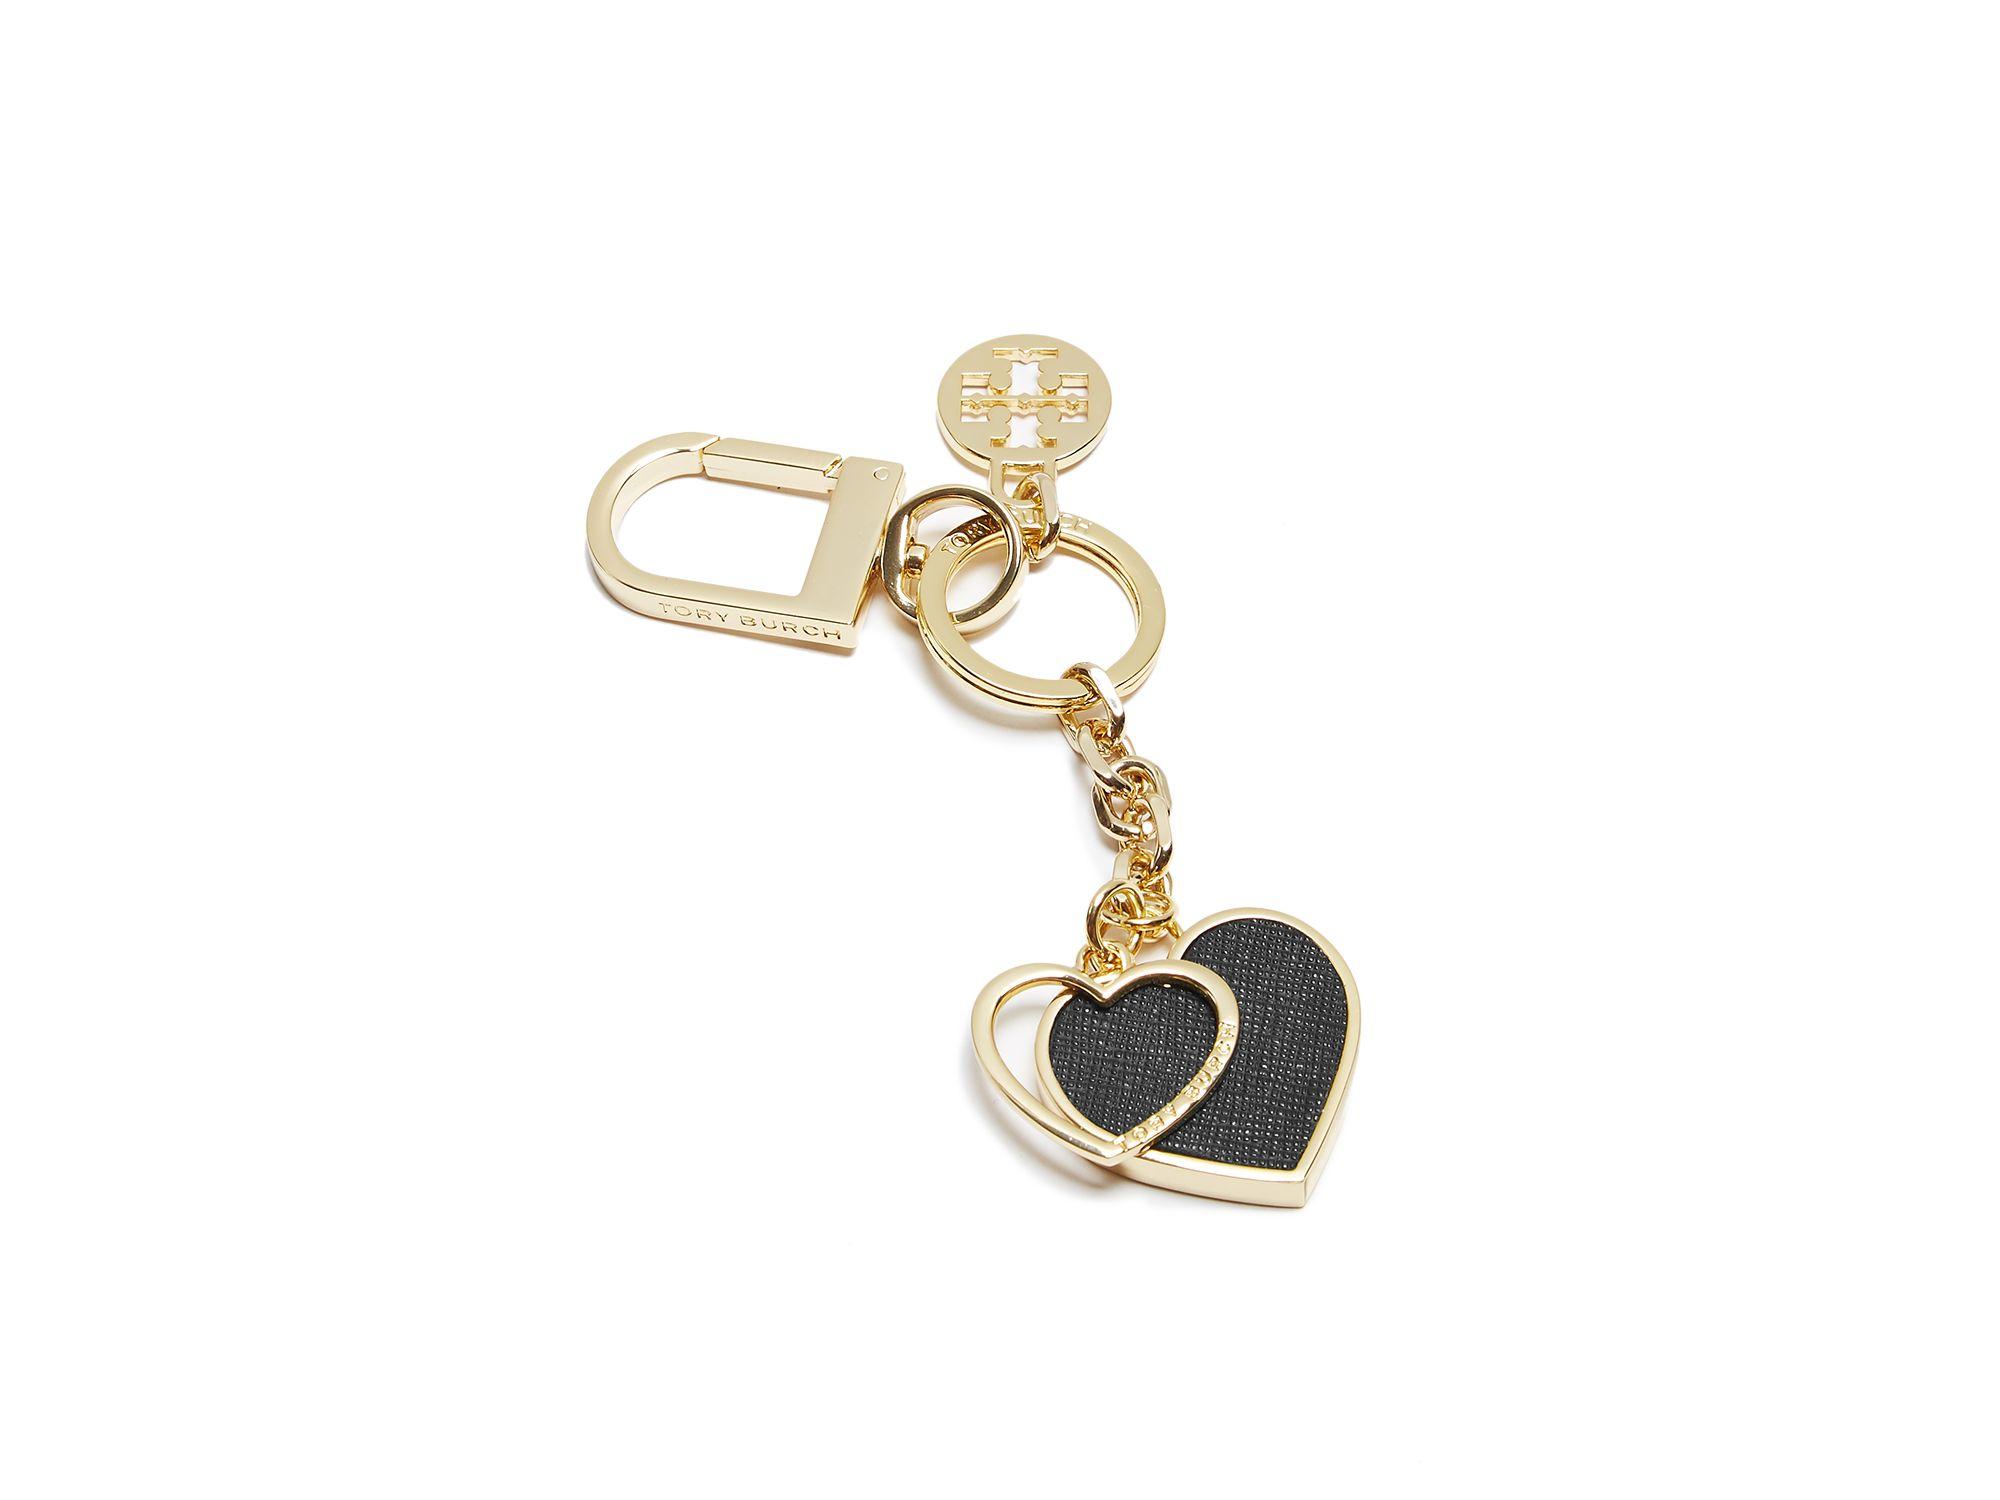 14918d8d7b40 Lyst - Tory Burch Logo Heart Key Fob in Black